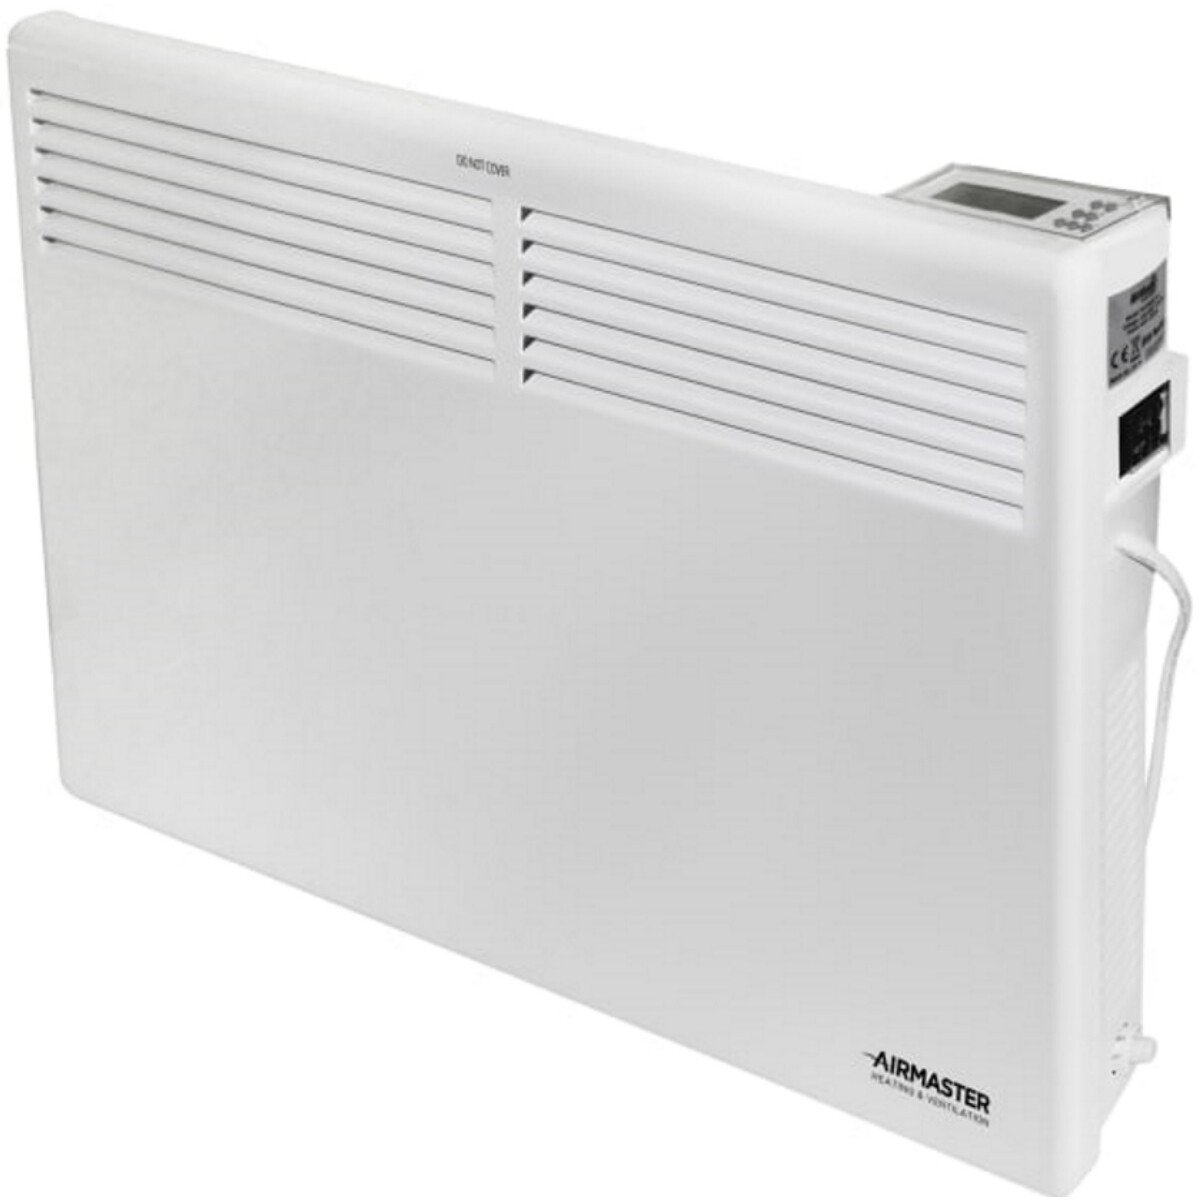 Airmaster PH1.5TIM/LCDN Wall Mounting Digital Panel Heater 1.5kW AIRPH15TIM